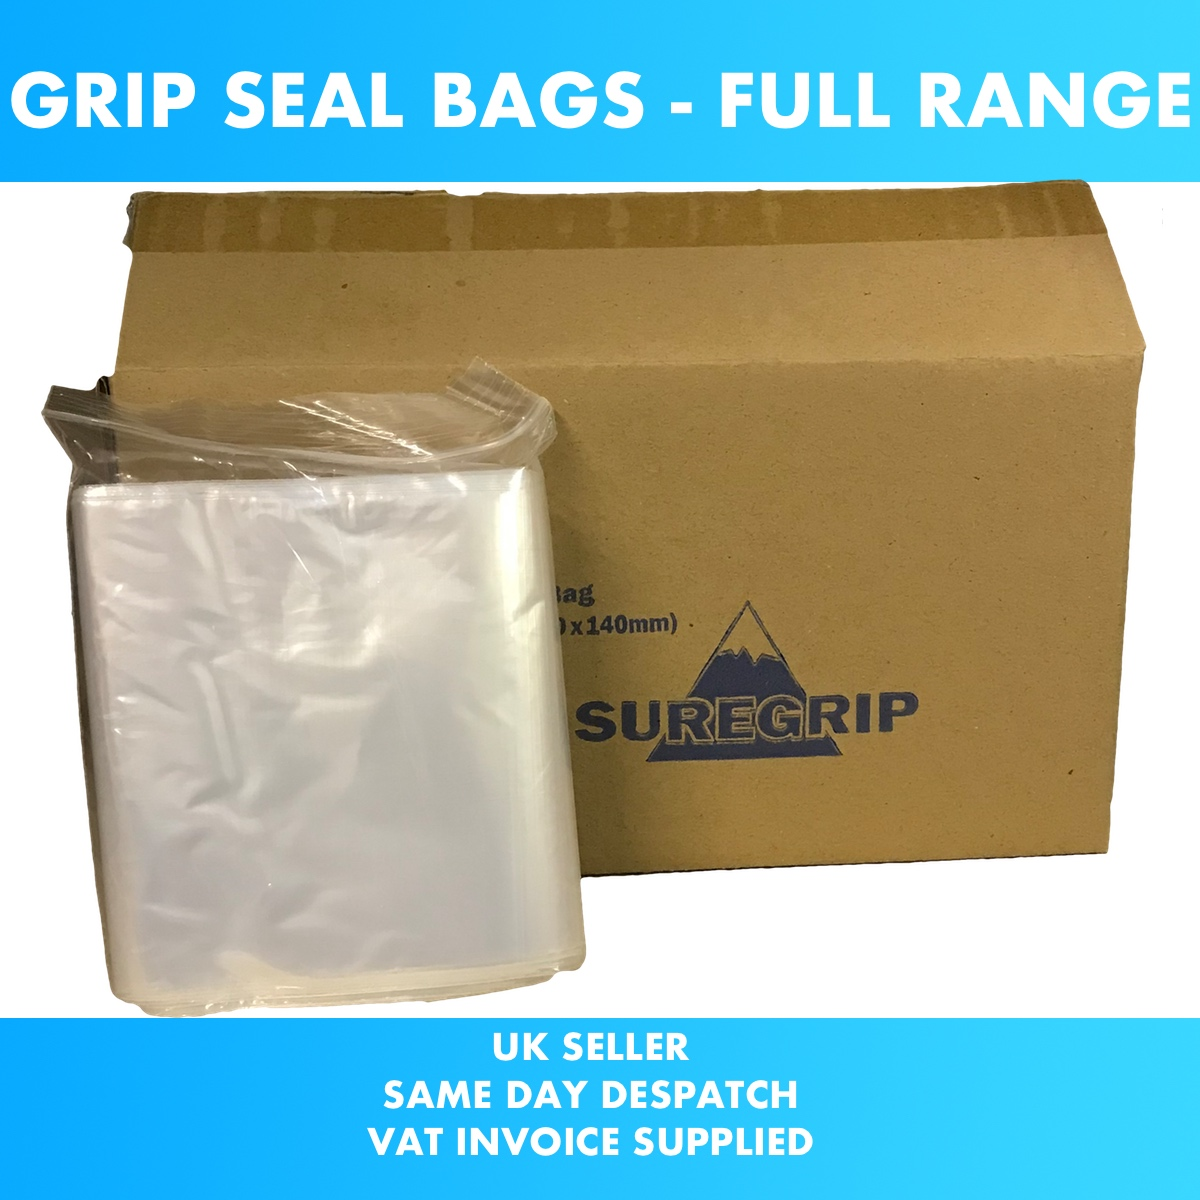 Small Clear Bags Plastic Baggies Grip Self Seal Resealable Zip Lock High Quality B3